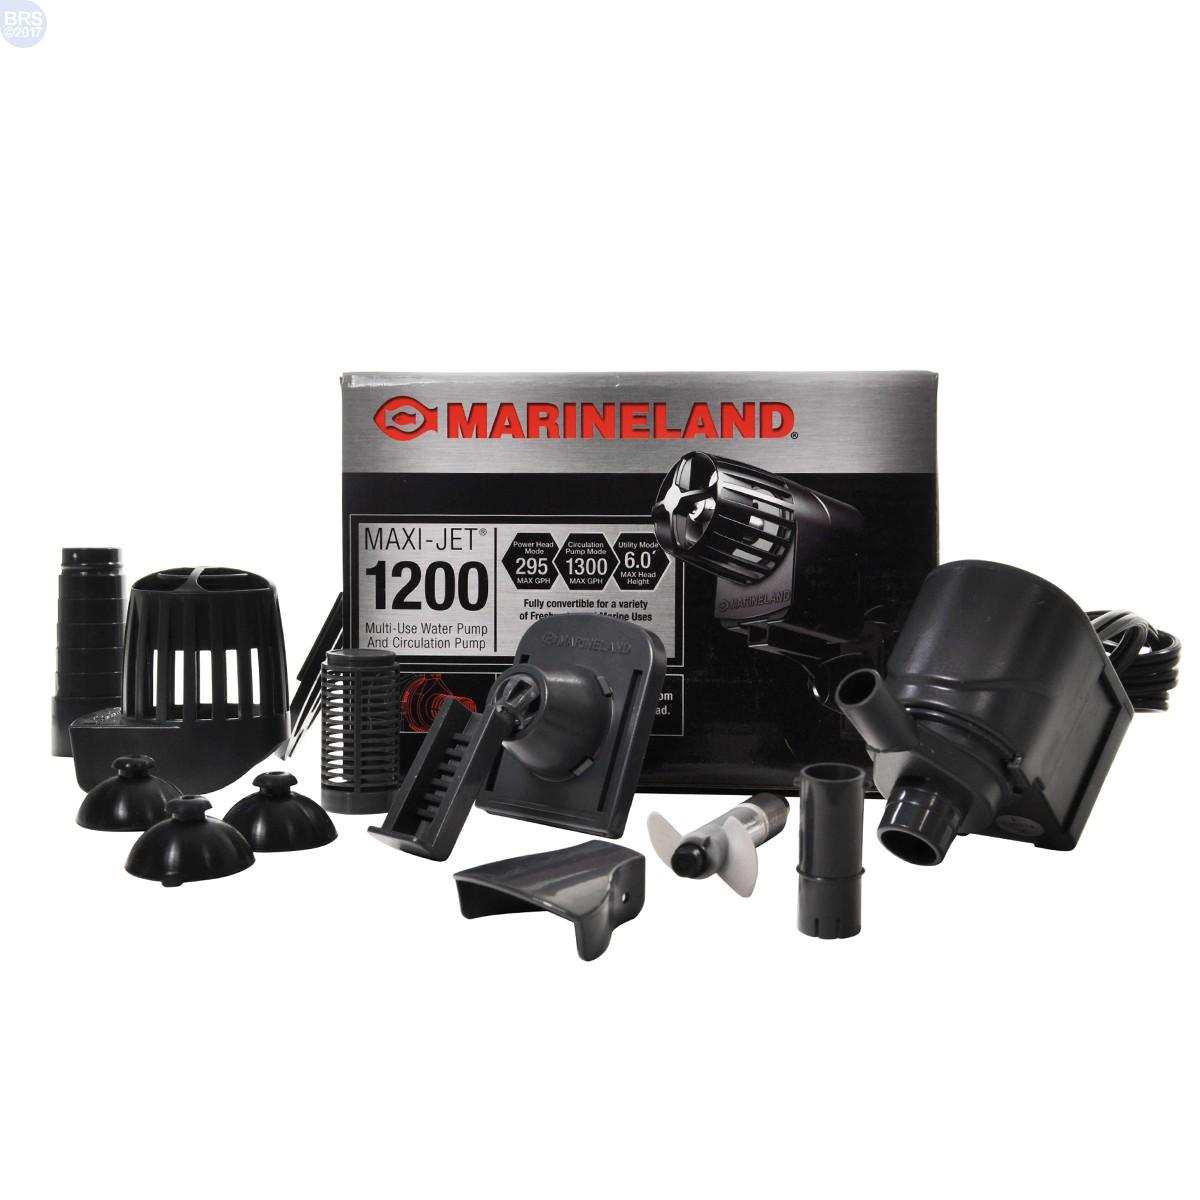 Maxi-Jet Powerhead 1200 - Marineland - Bulk Reef Supply